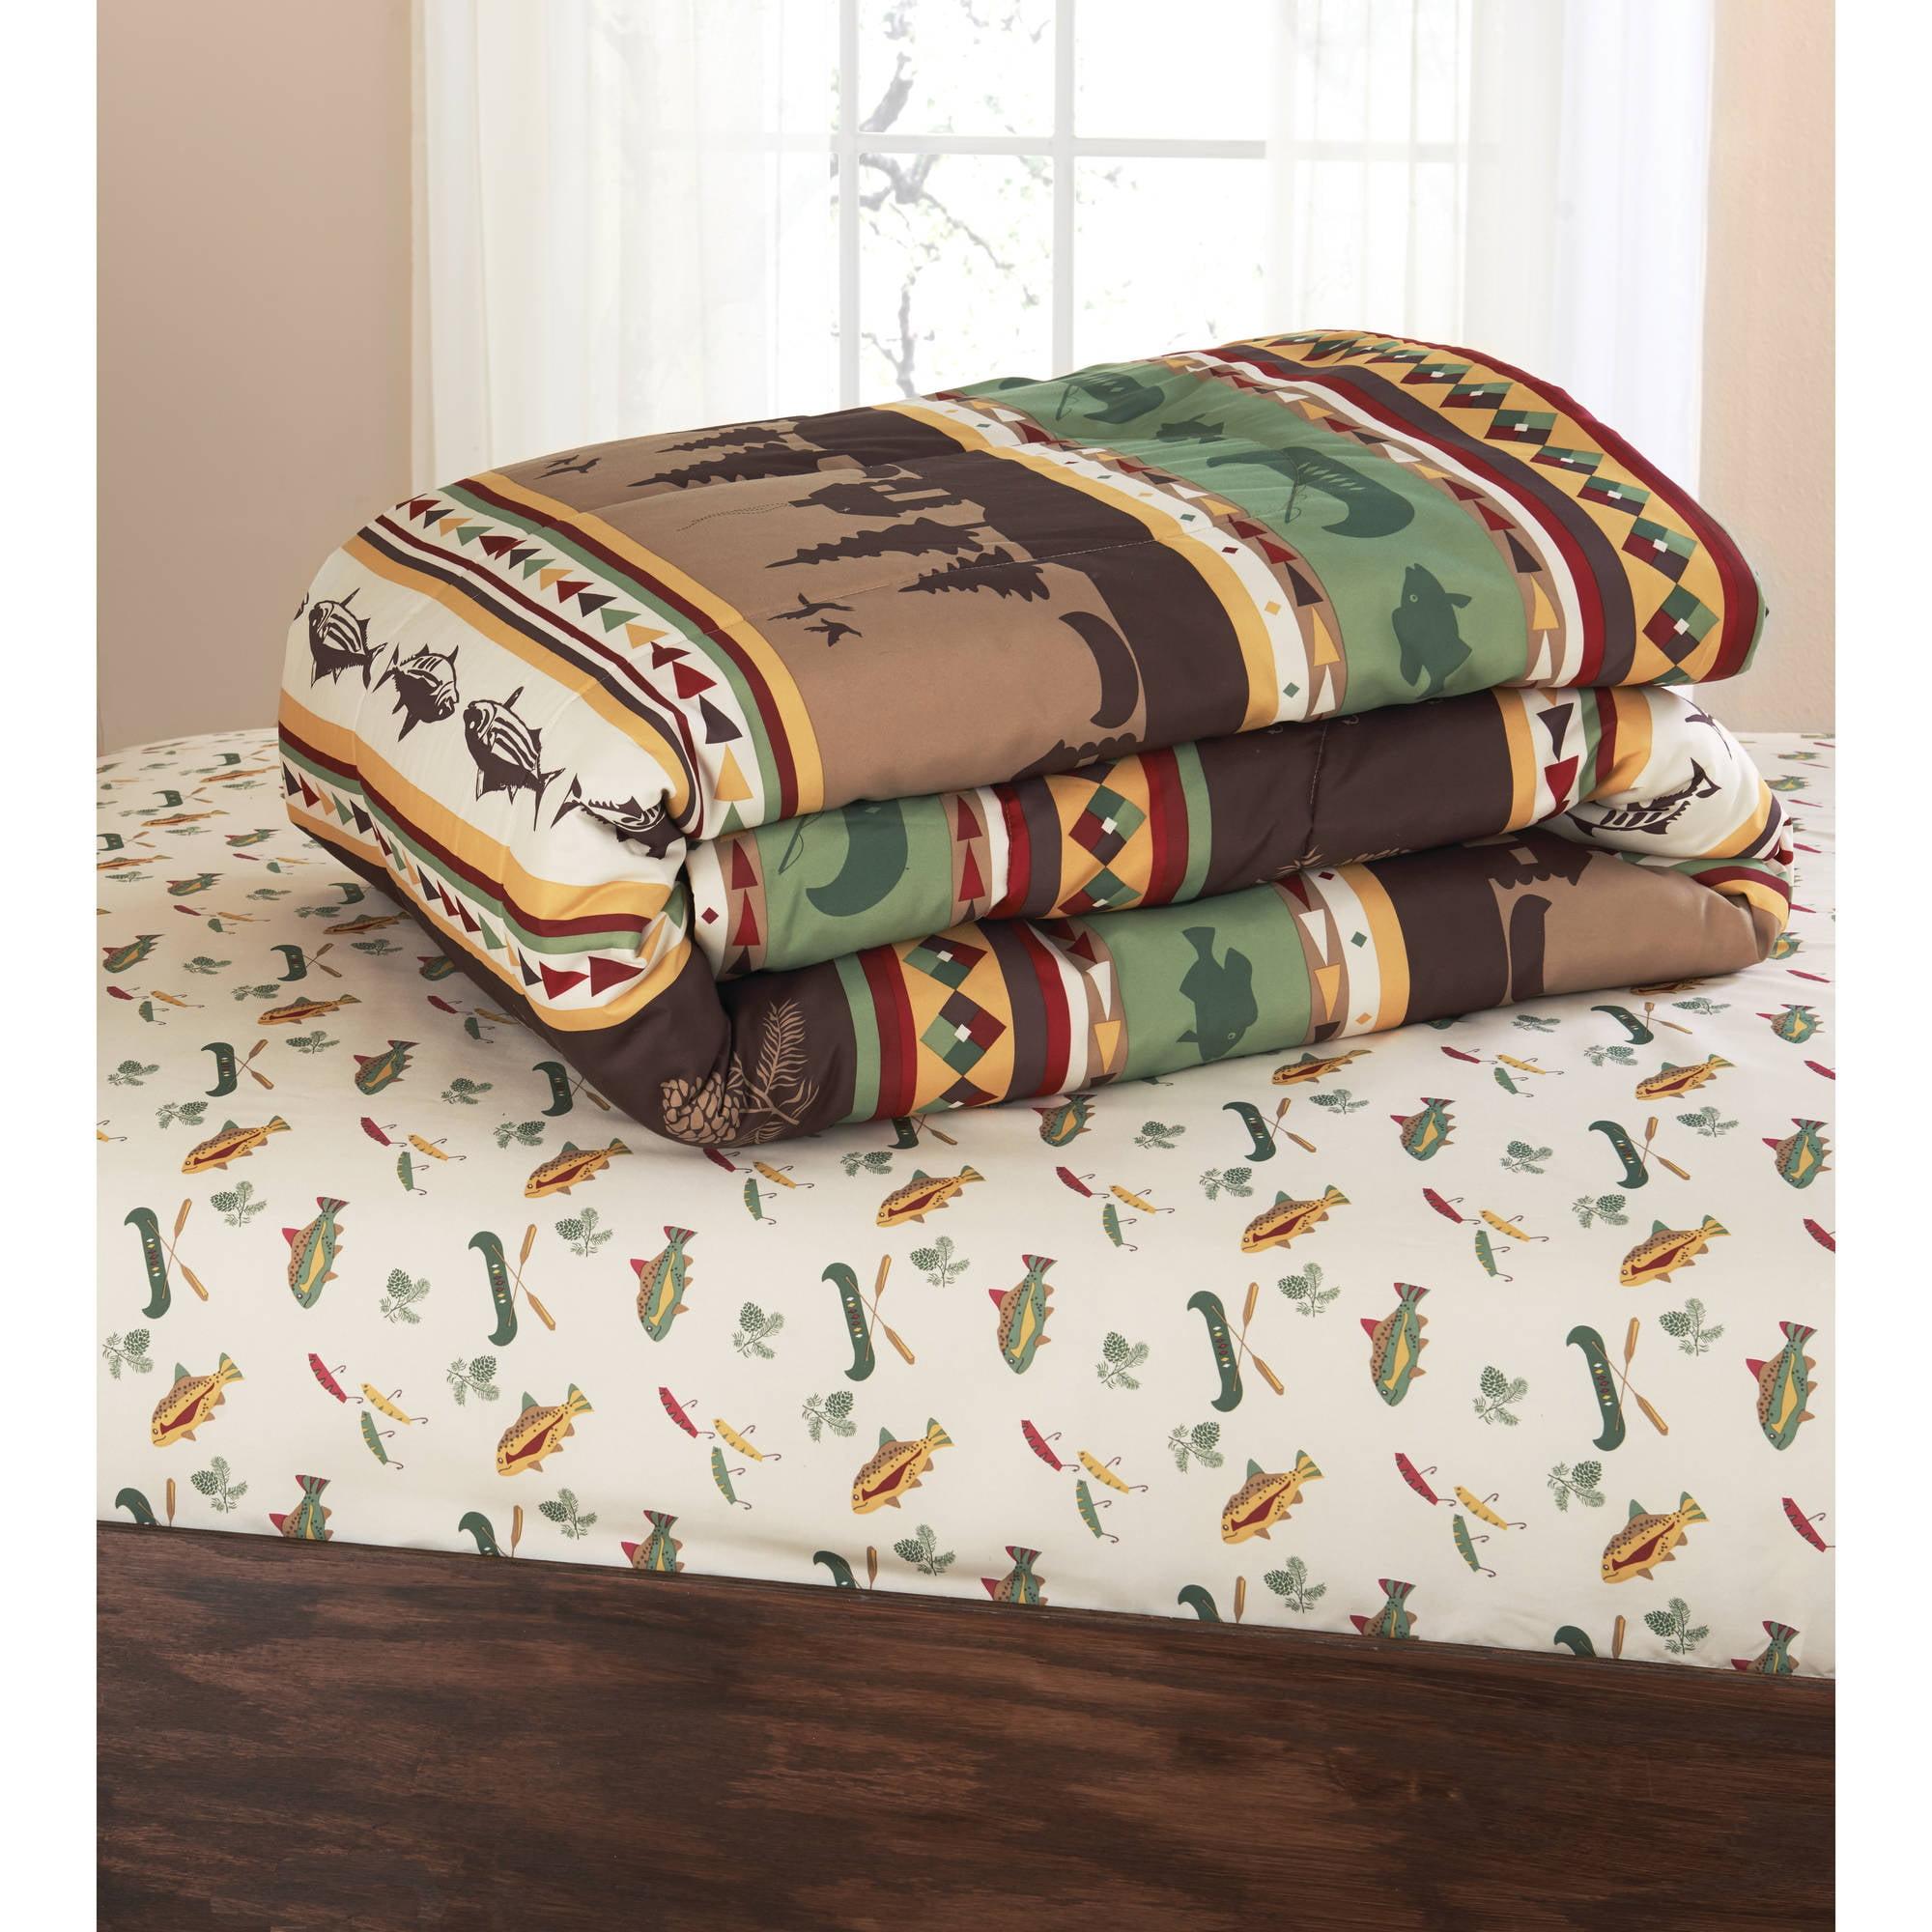 bedding set queen size fitted sheets comforter gone fishing cabin pattern bed ebay. Black Bedroom Furniture Sets. Home Design Ideas